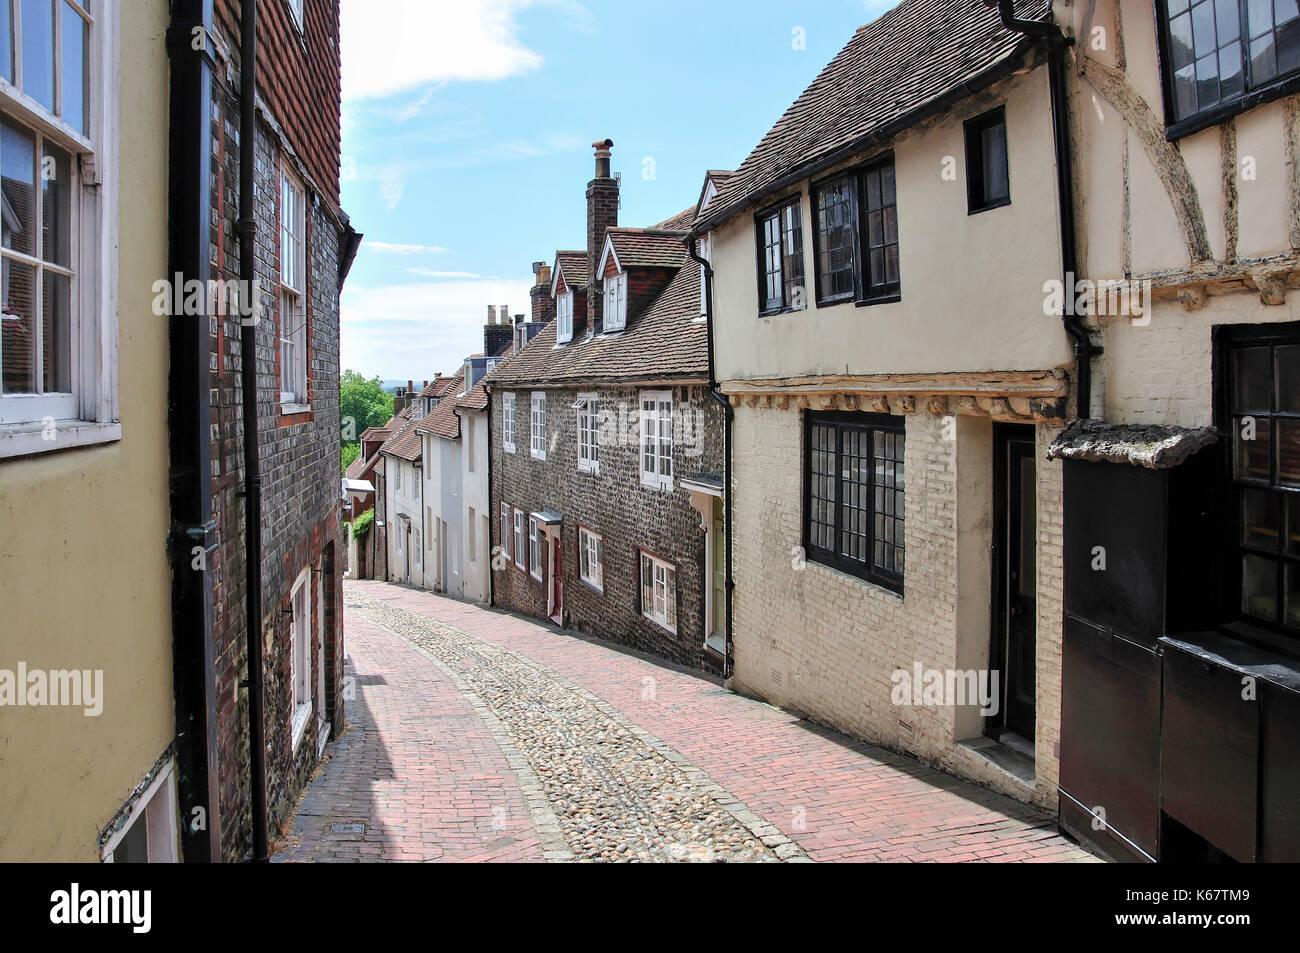 Period houses. Keere Street, Lewes, East Sussex, England, United Kingdom Stock Photo